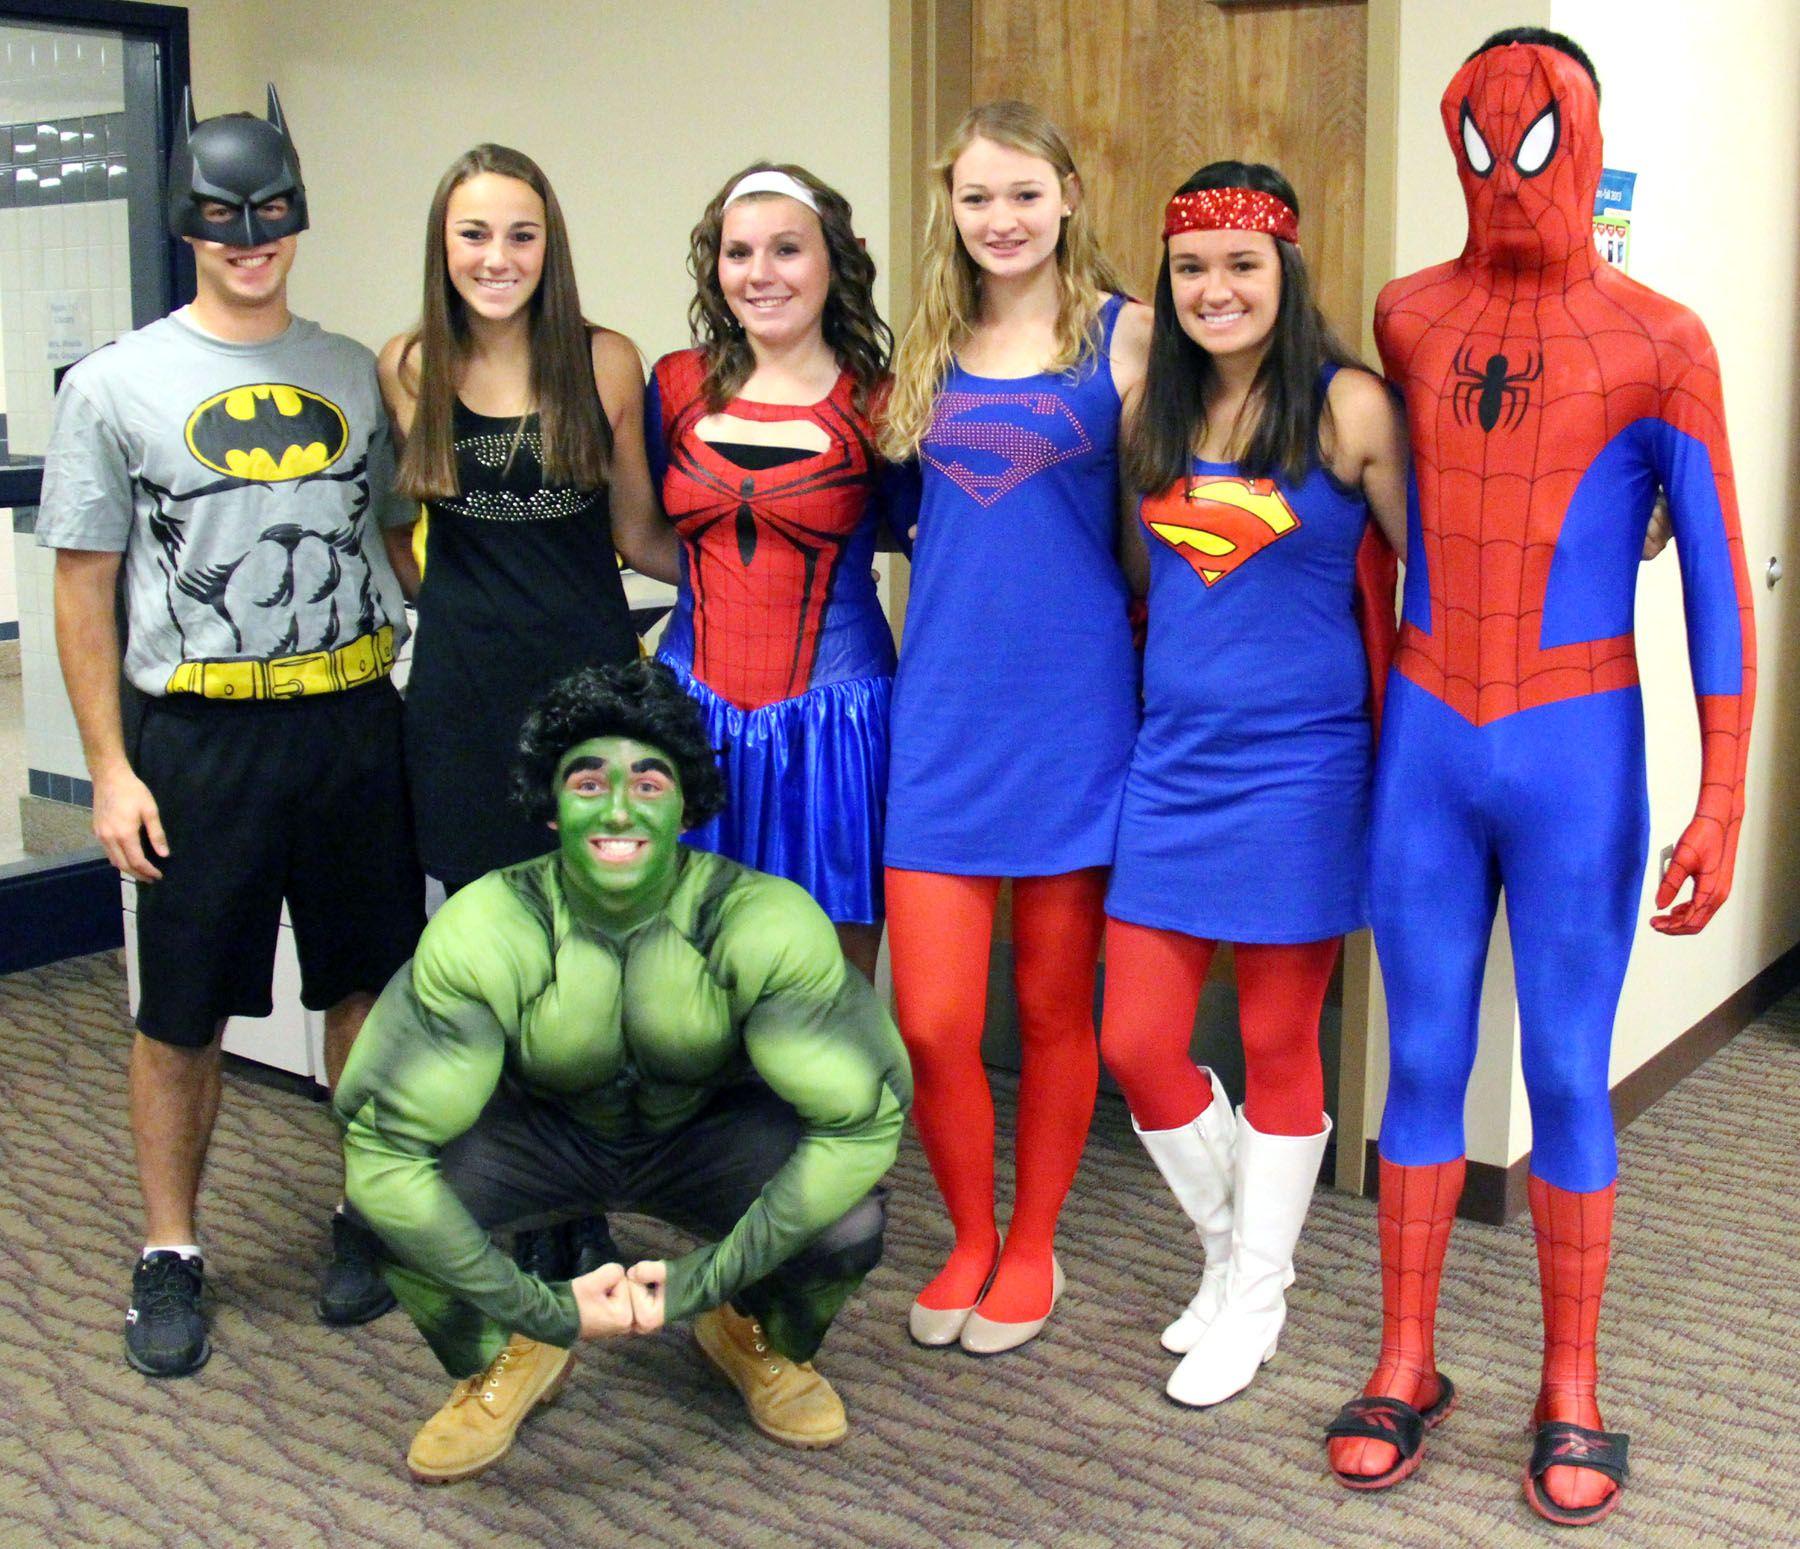 Superhero Day At Pulaski High School Reaches Impressive